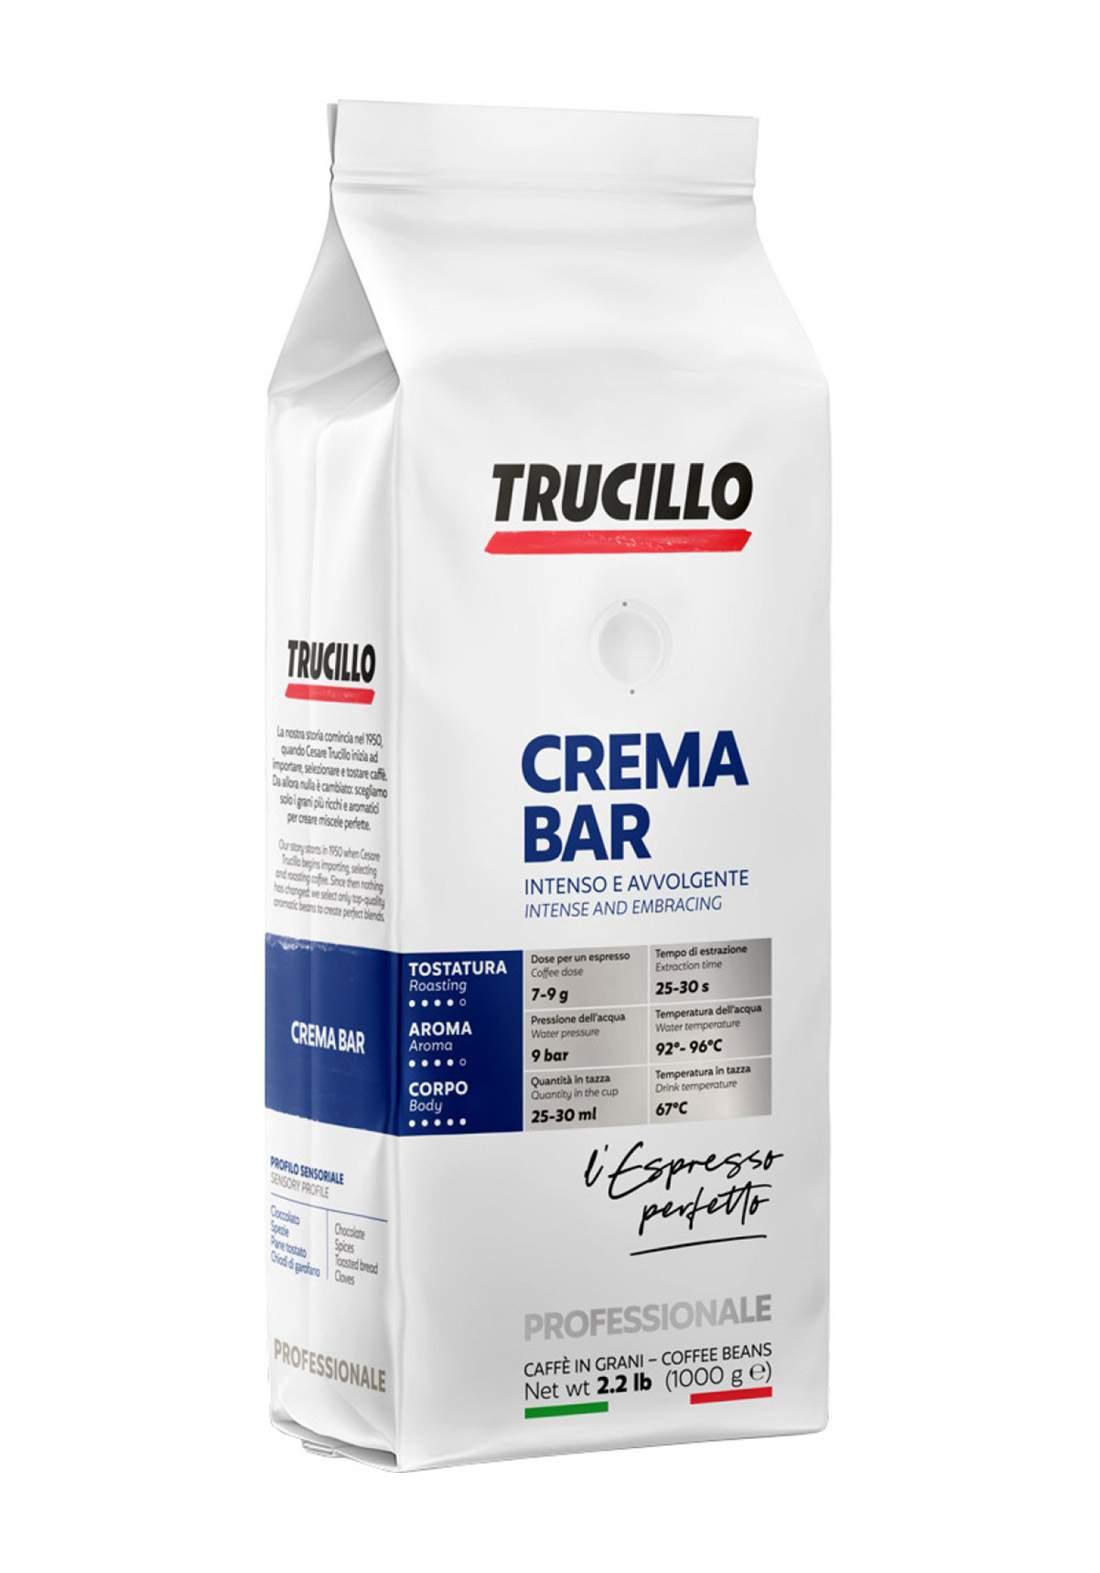 Trucillo Premium Crema Bar 1Kg قهوة